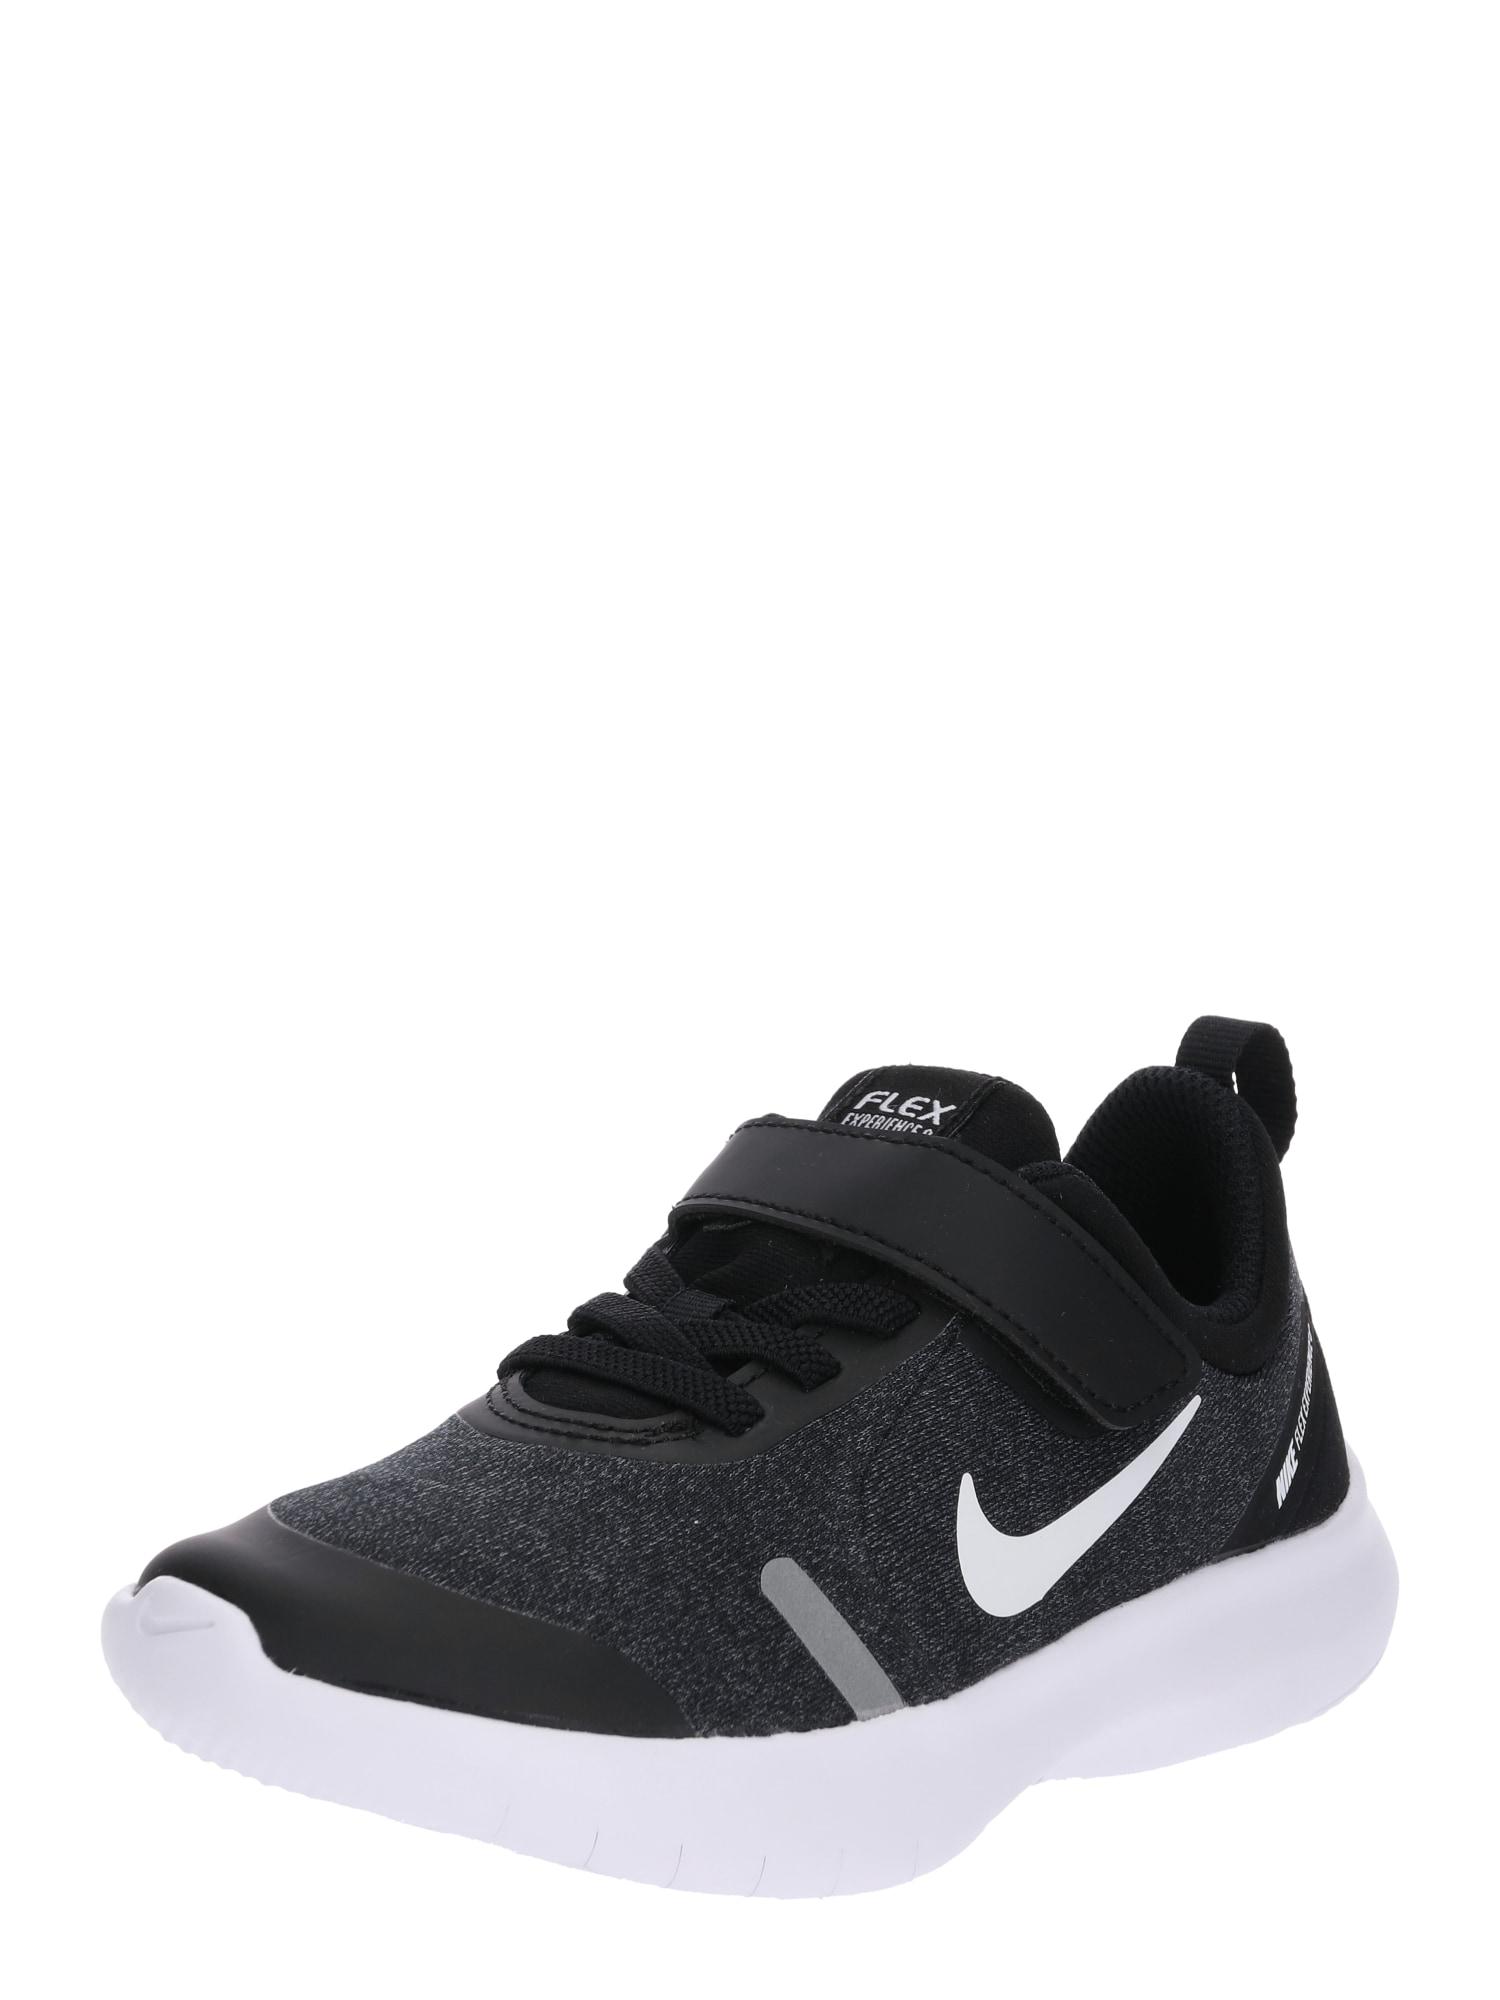 NIKE Sportovní boty 'Flex Experience RN 8'  černá / stříbrná / bílá